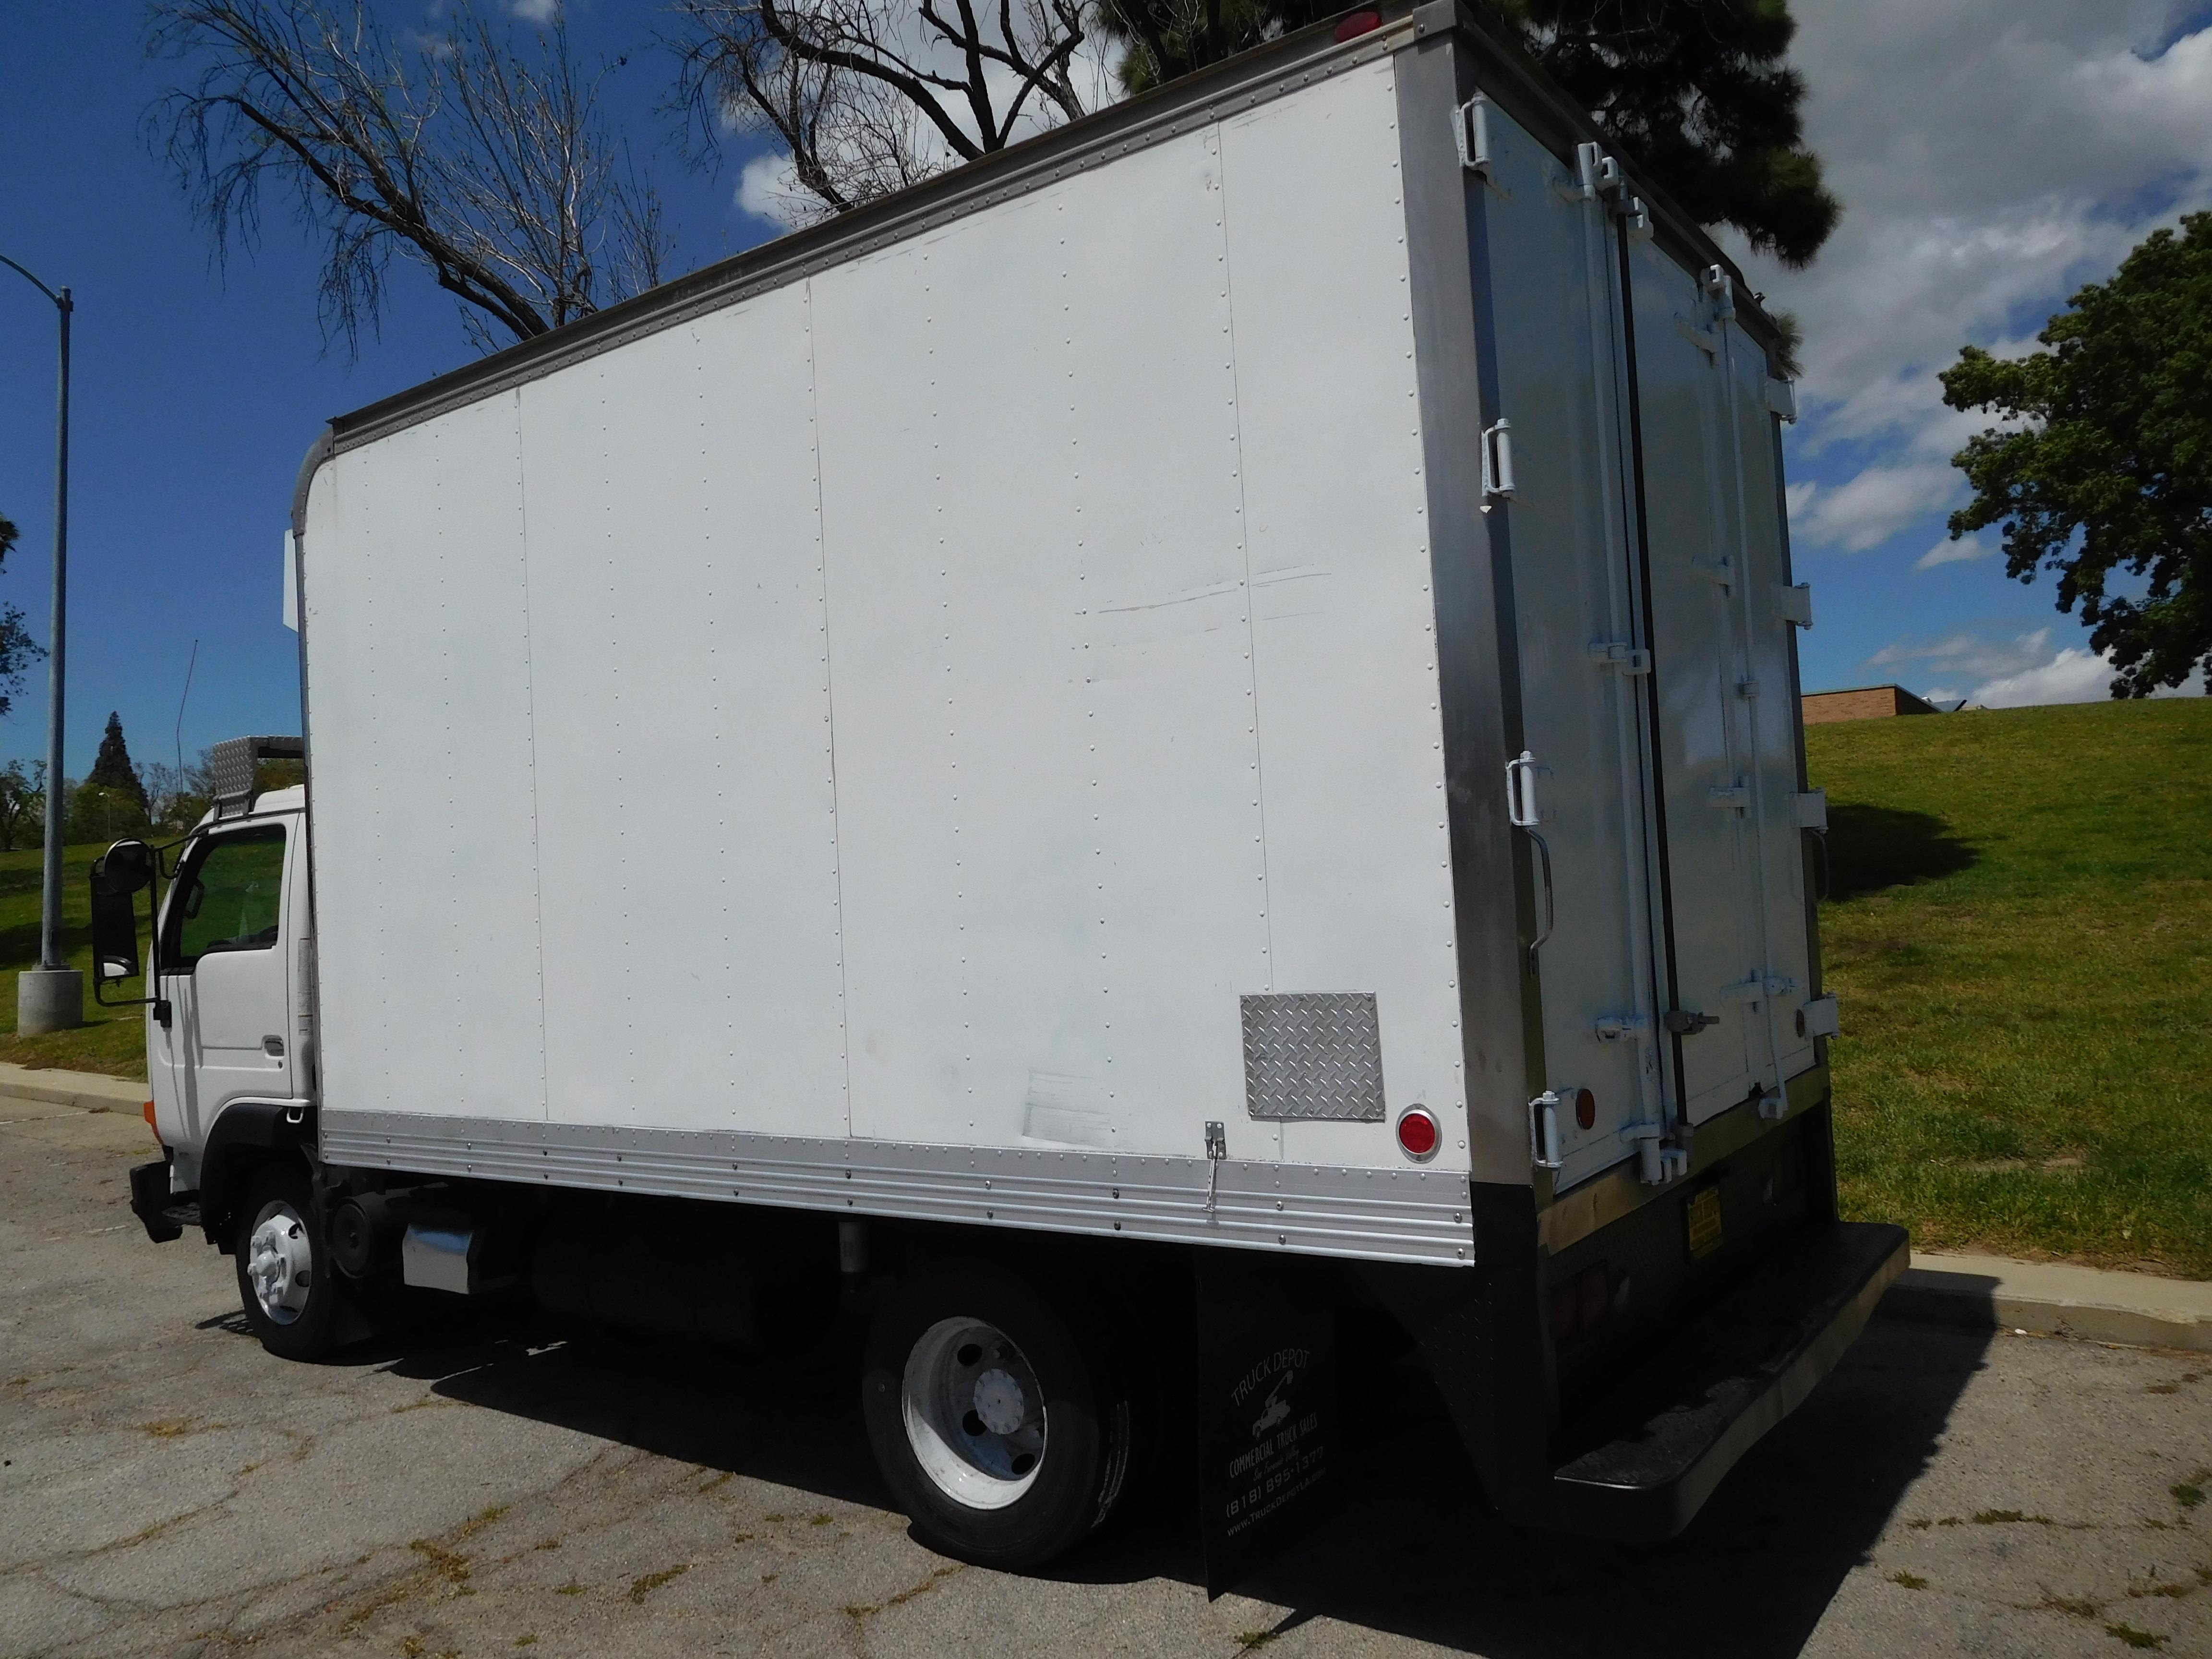 2000 white nissan ud 1800 cs truck depot rh truckdepotofla com 1992 Nissan  Ud 1800 Manual Nissan UD 1400 Join Lines